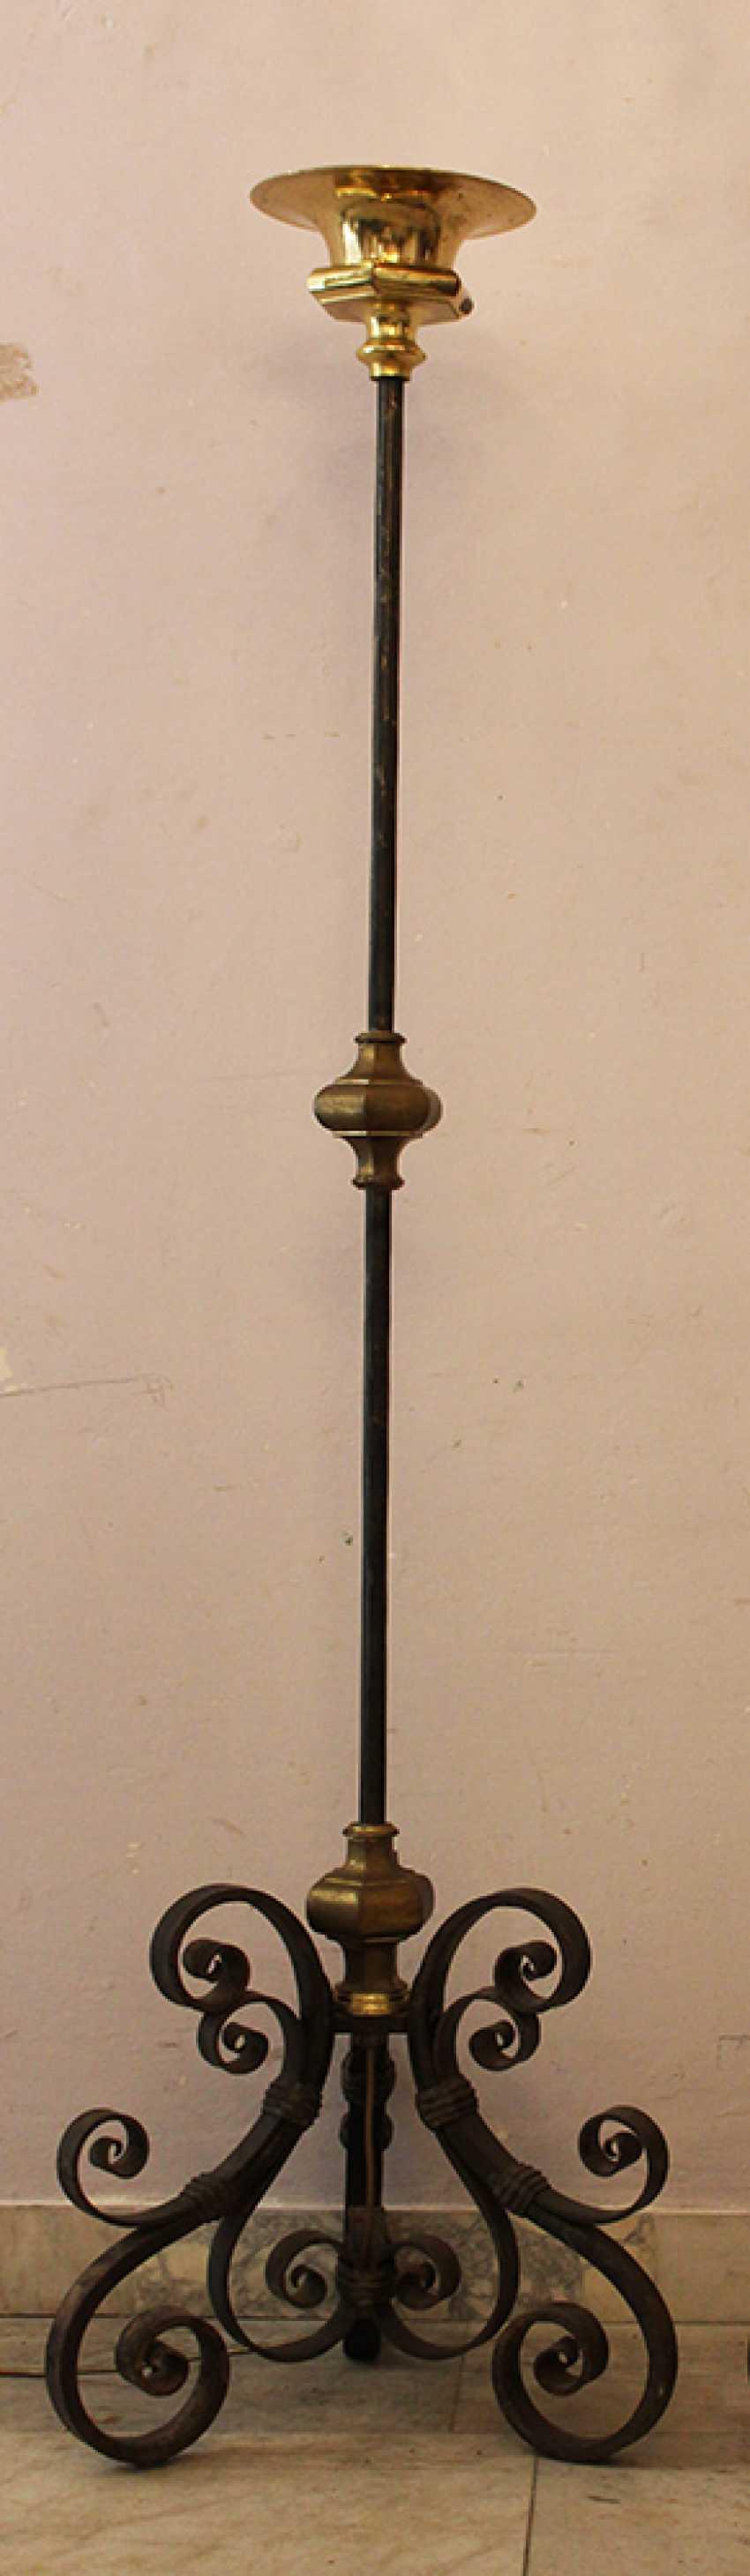 Pair of Spanish Iron Lighters  - photo 2